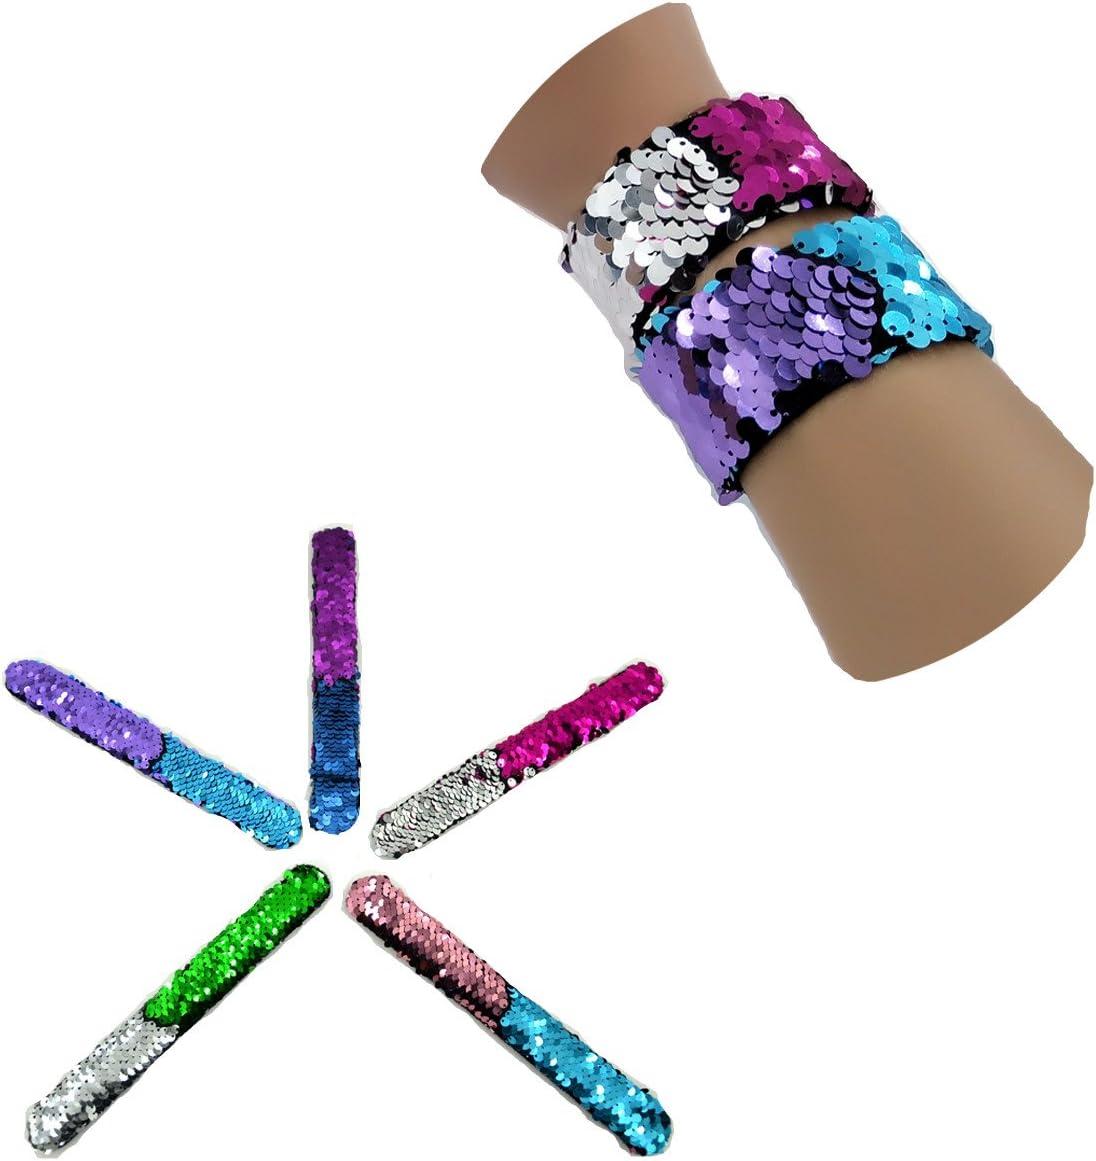 JACHAM Mermaid Bracelet Party Supplies for Birthday 24pack Emoji Keychain